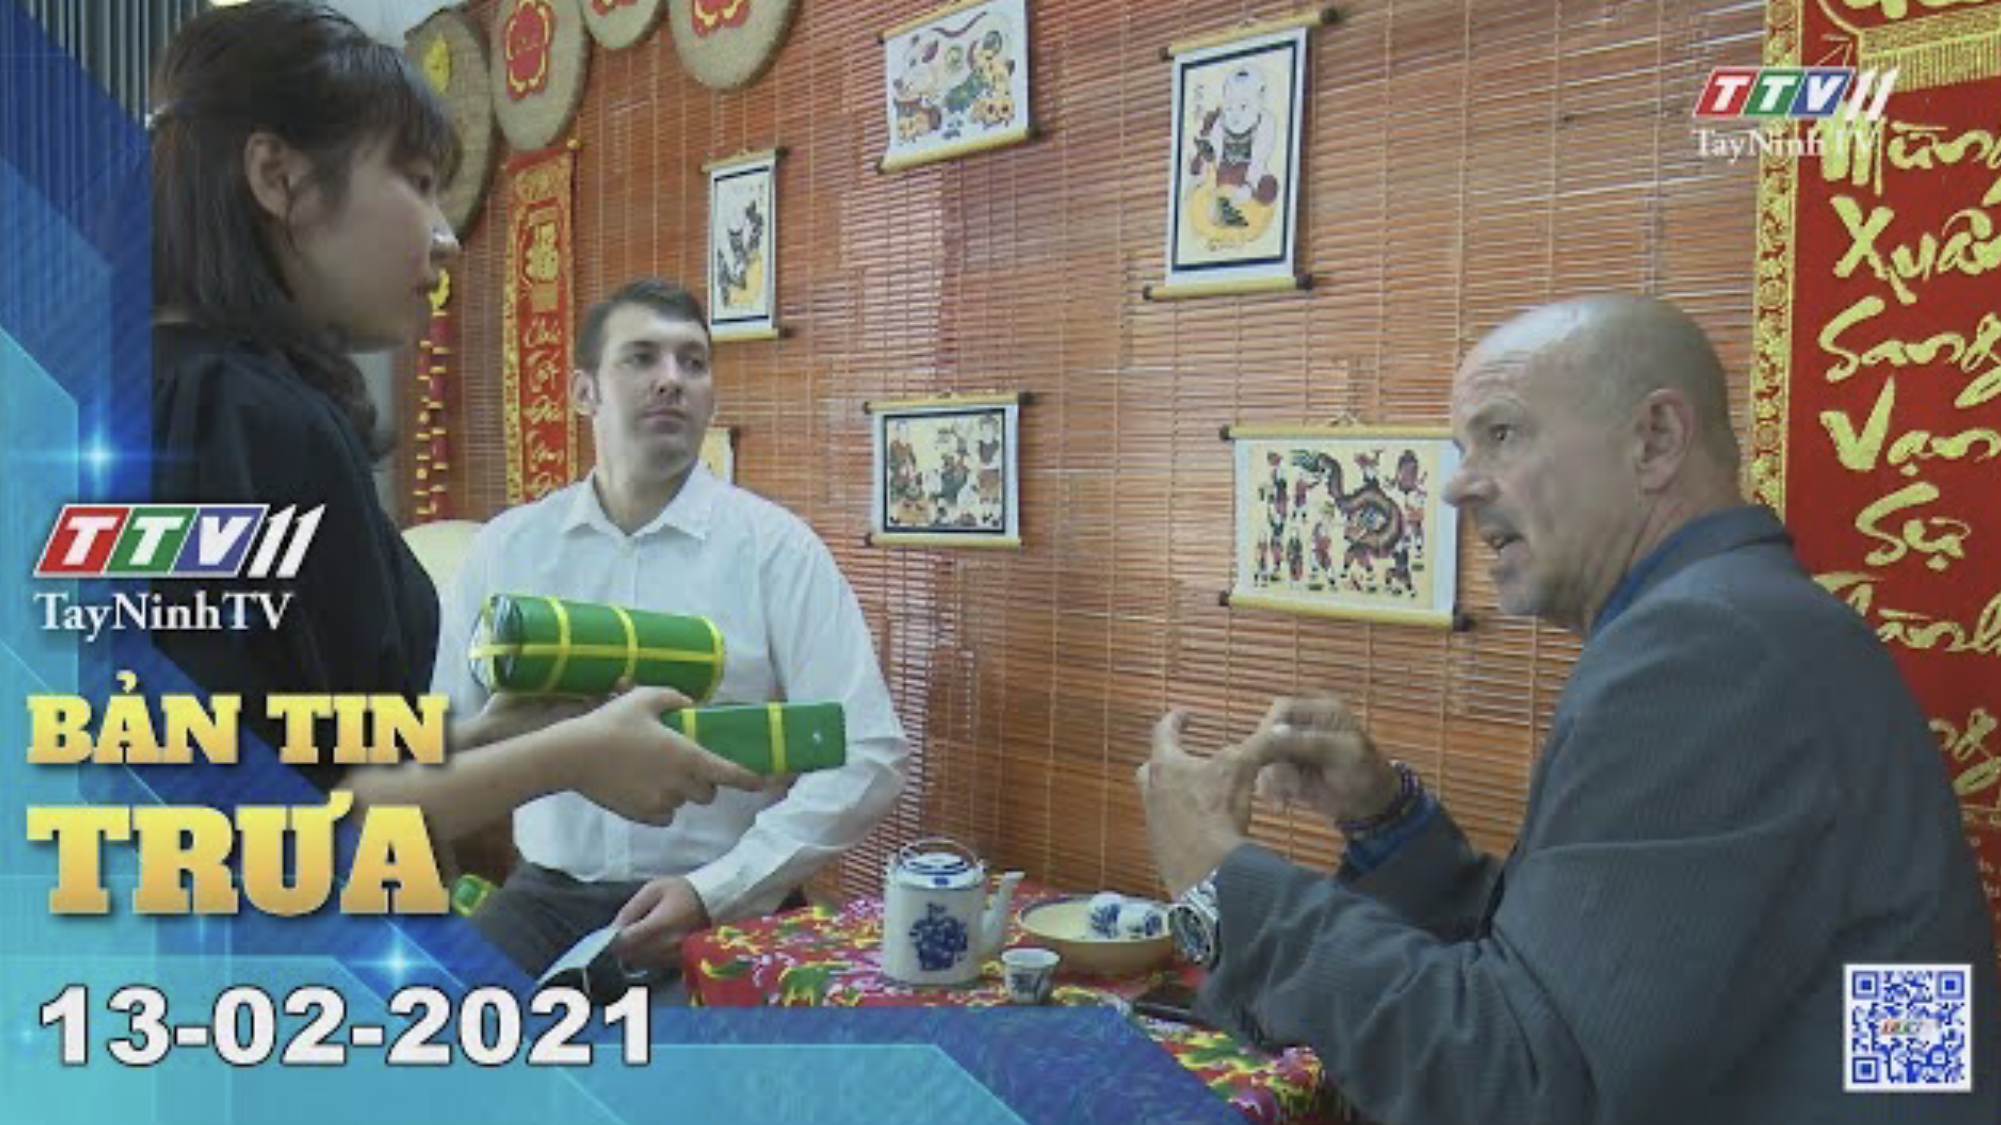 Bản tin trưa 13-02-2021 | Tin tức hôm nay | TayNinhTV